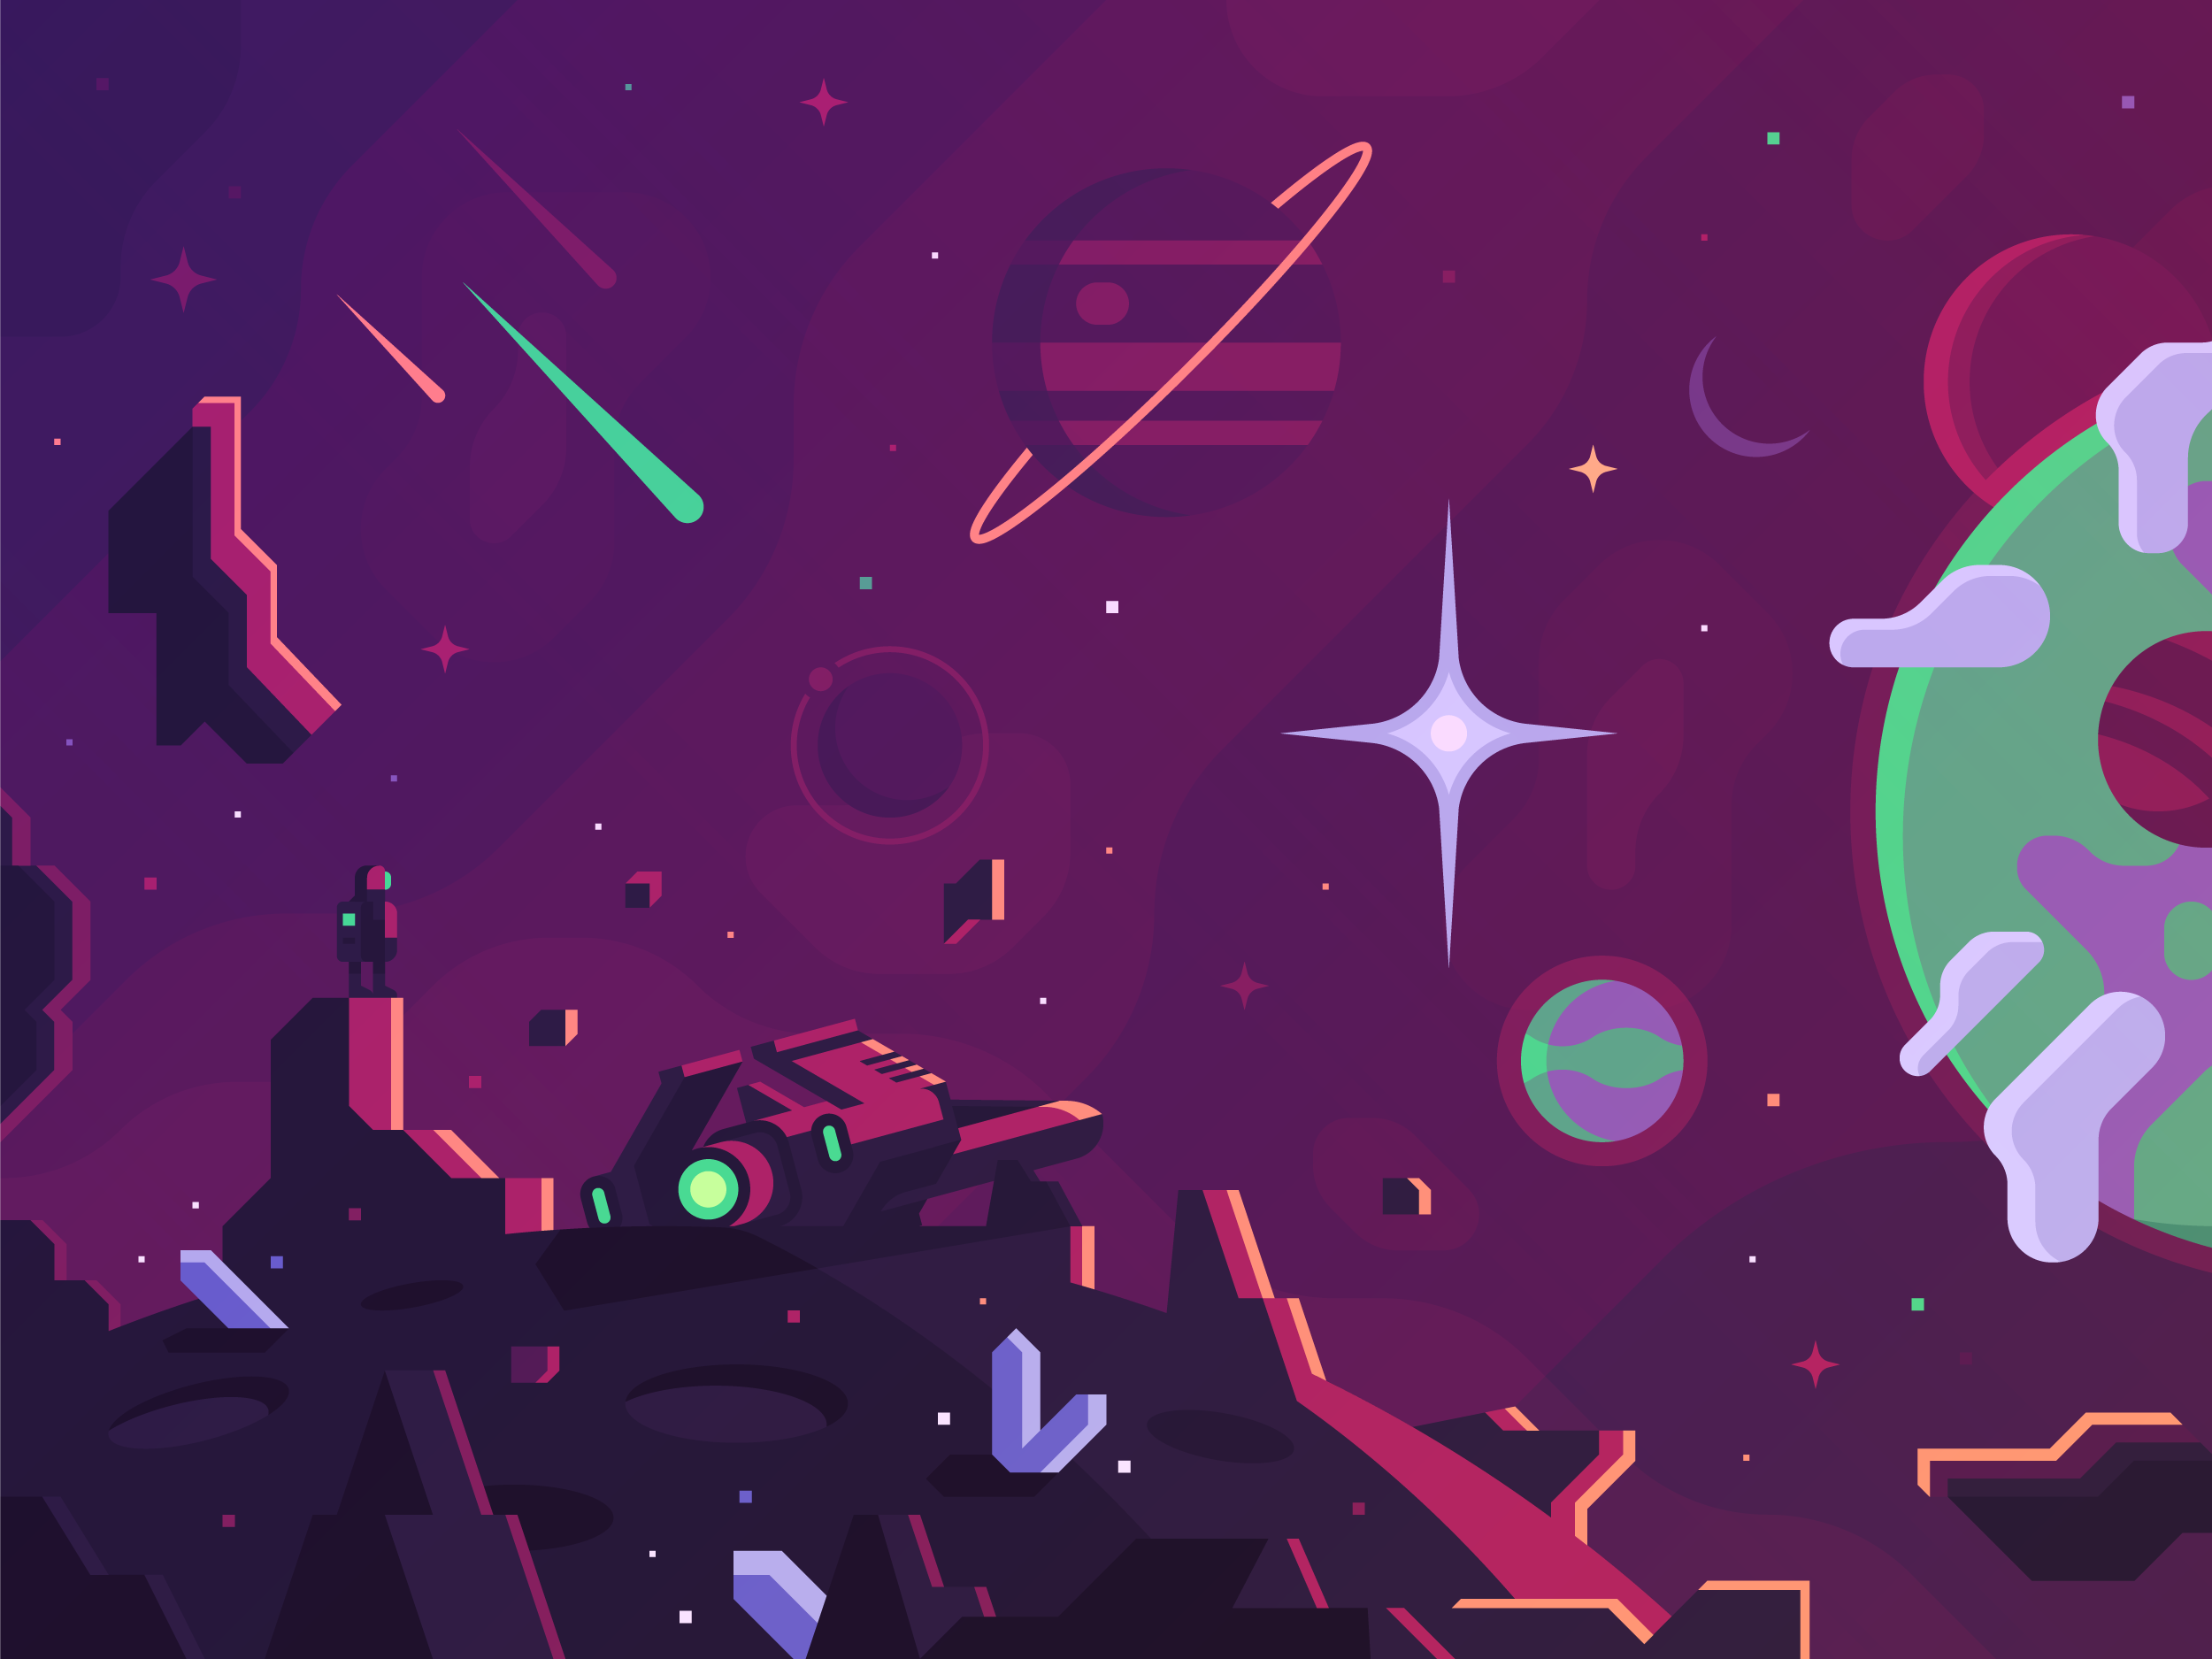 Dots - Space concept art and game design by Alex Pasquarella